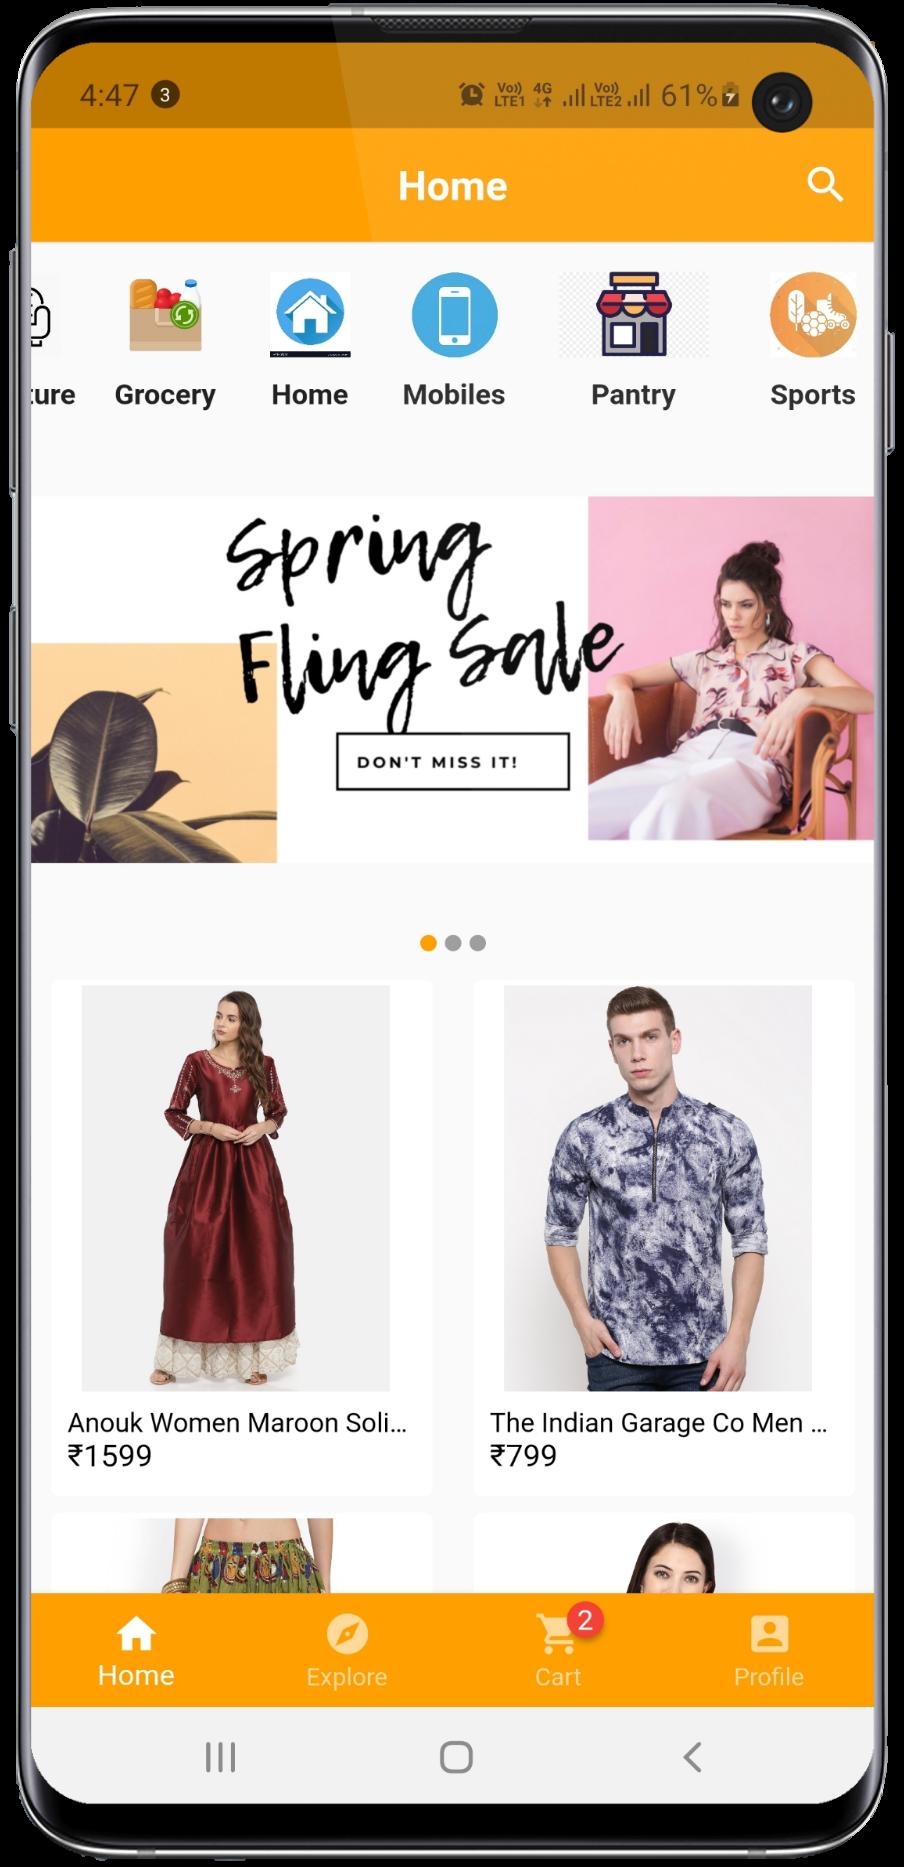 ecommerce mobile app cartwiz